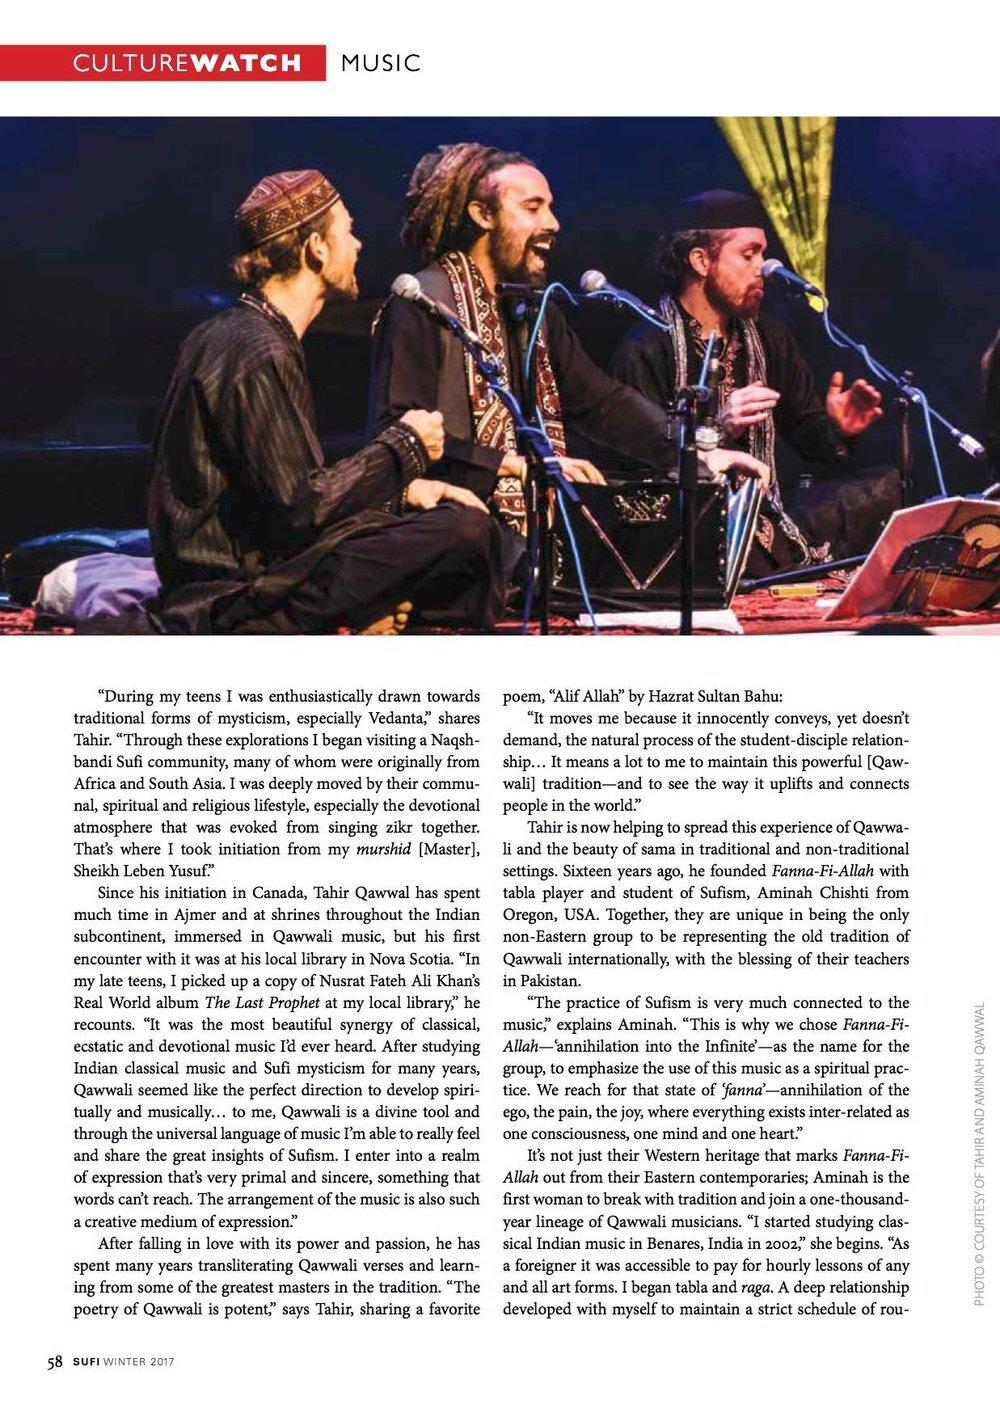 sufi-journal-fanna.jpeg